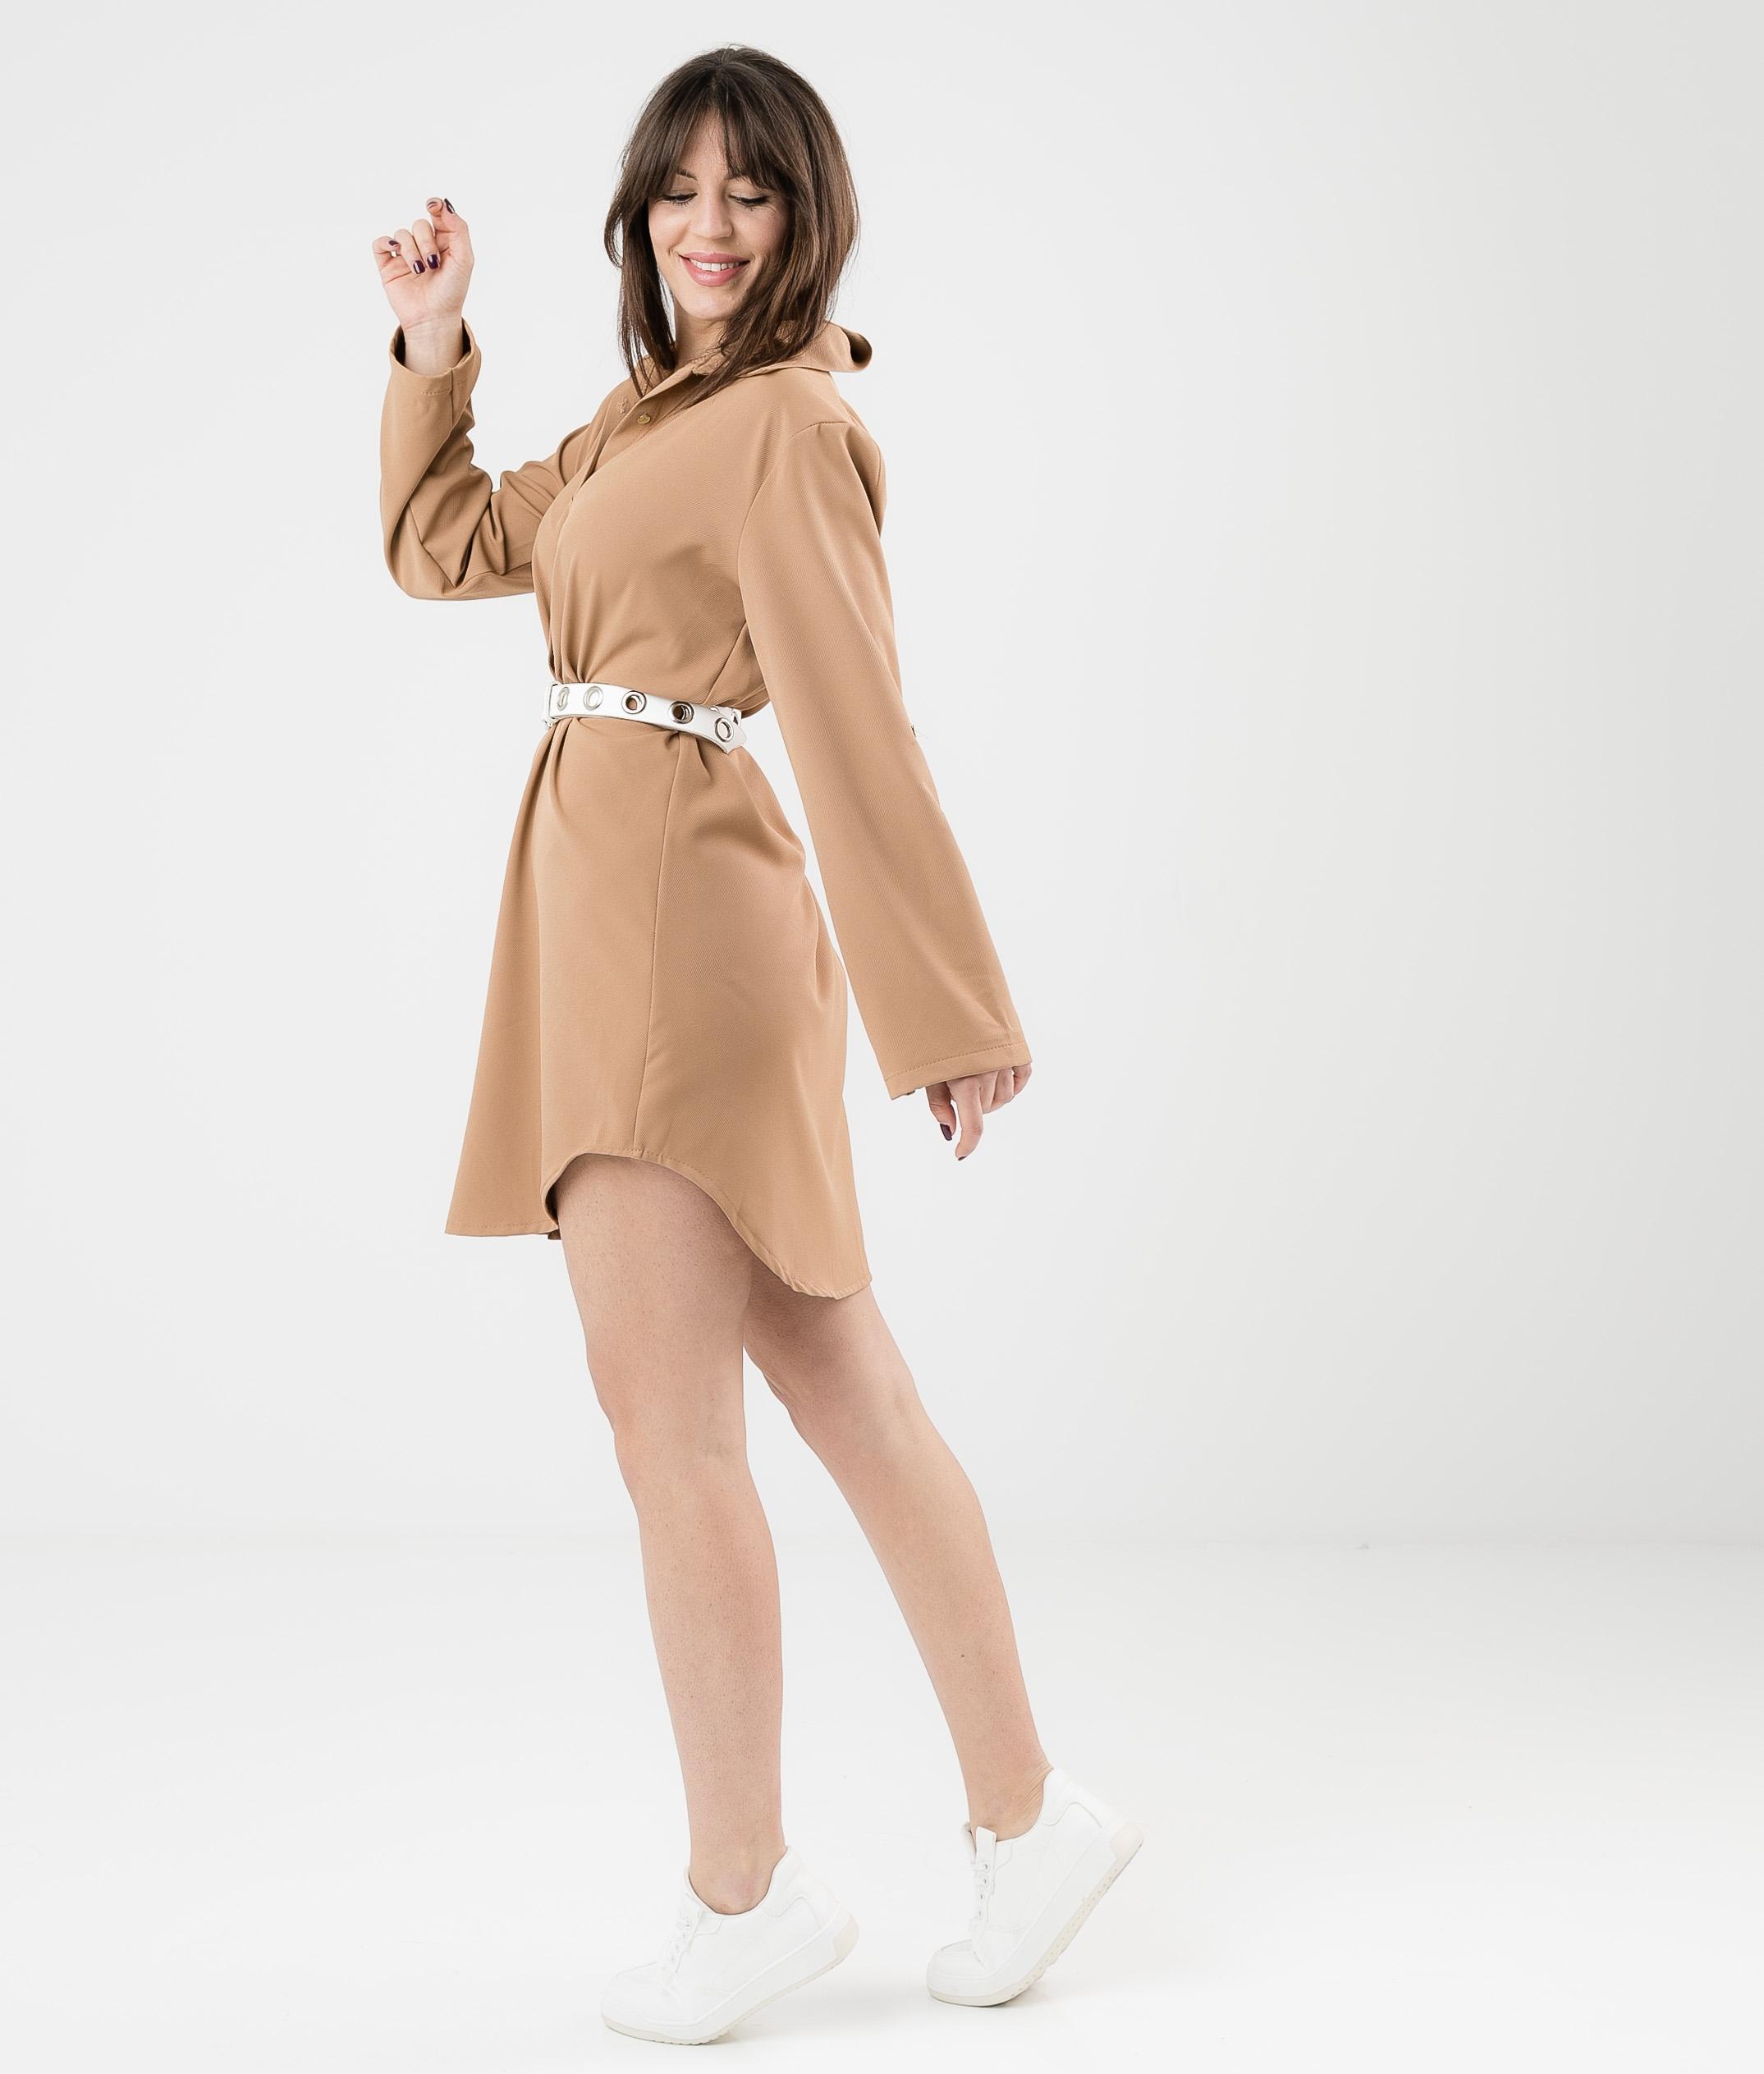 RIVEL DRESS - CAMEL